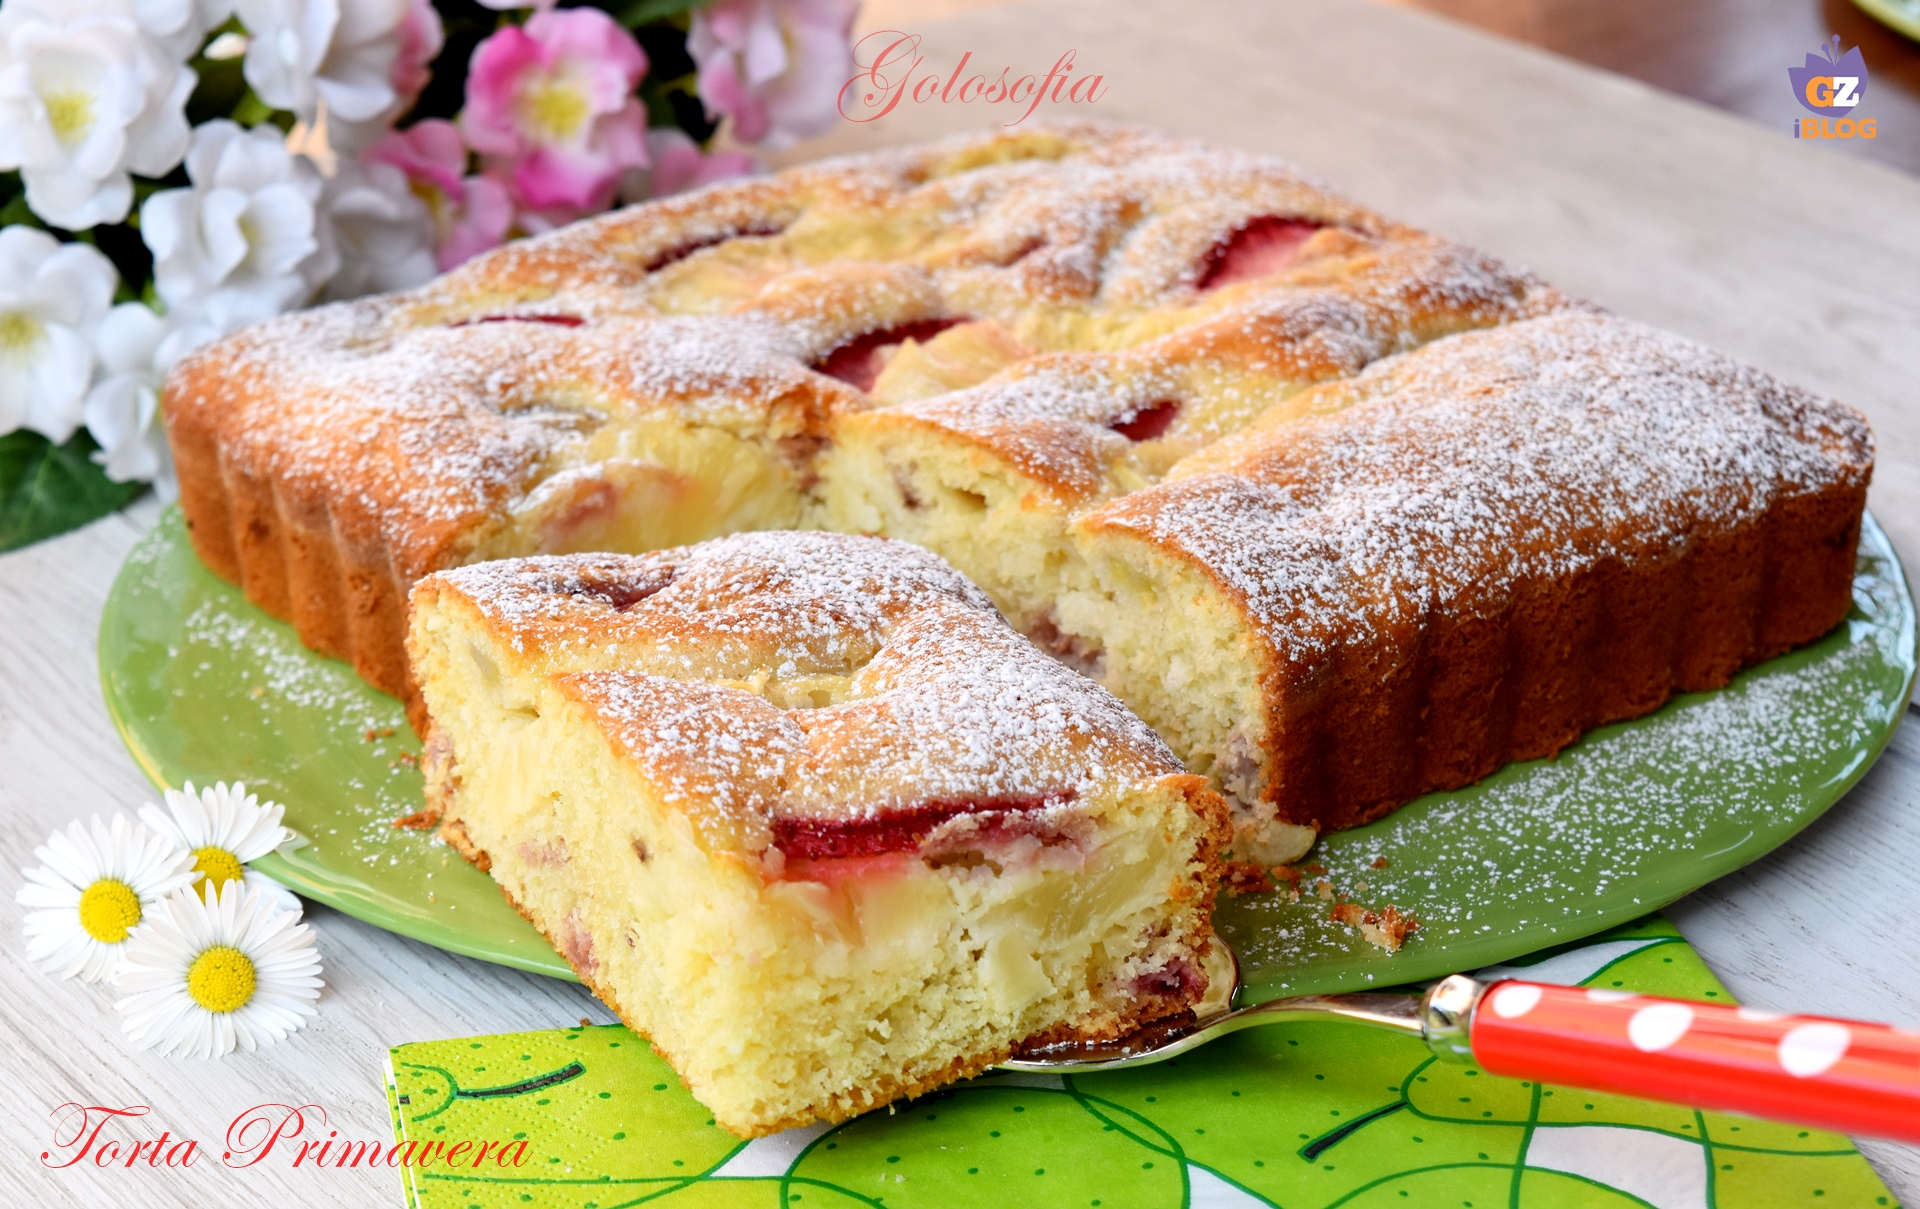 Torta Primavera con ananas, banana e fragole-ricetta torte-golosofia